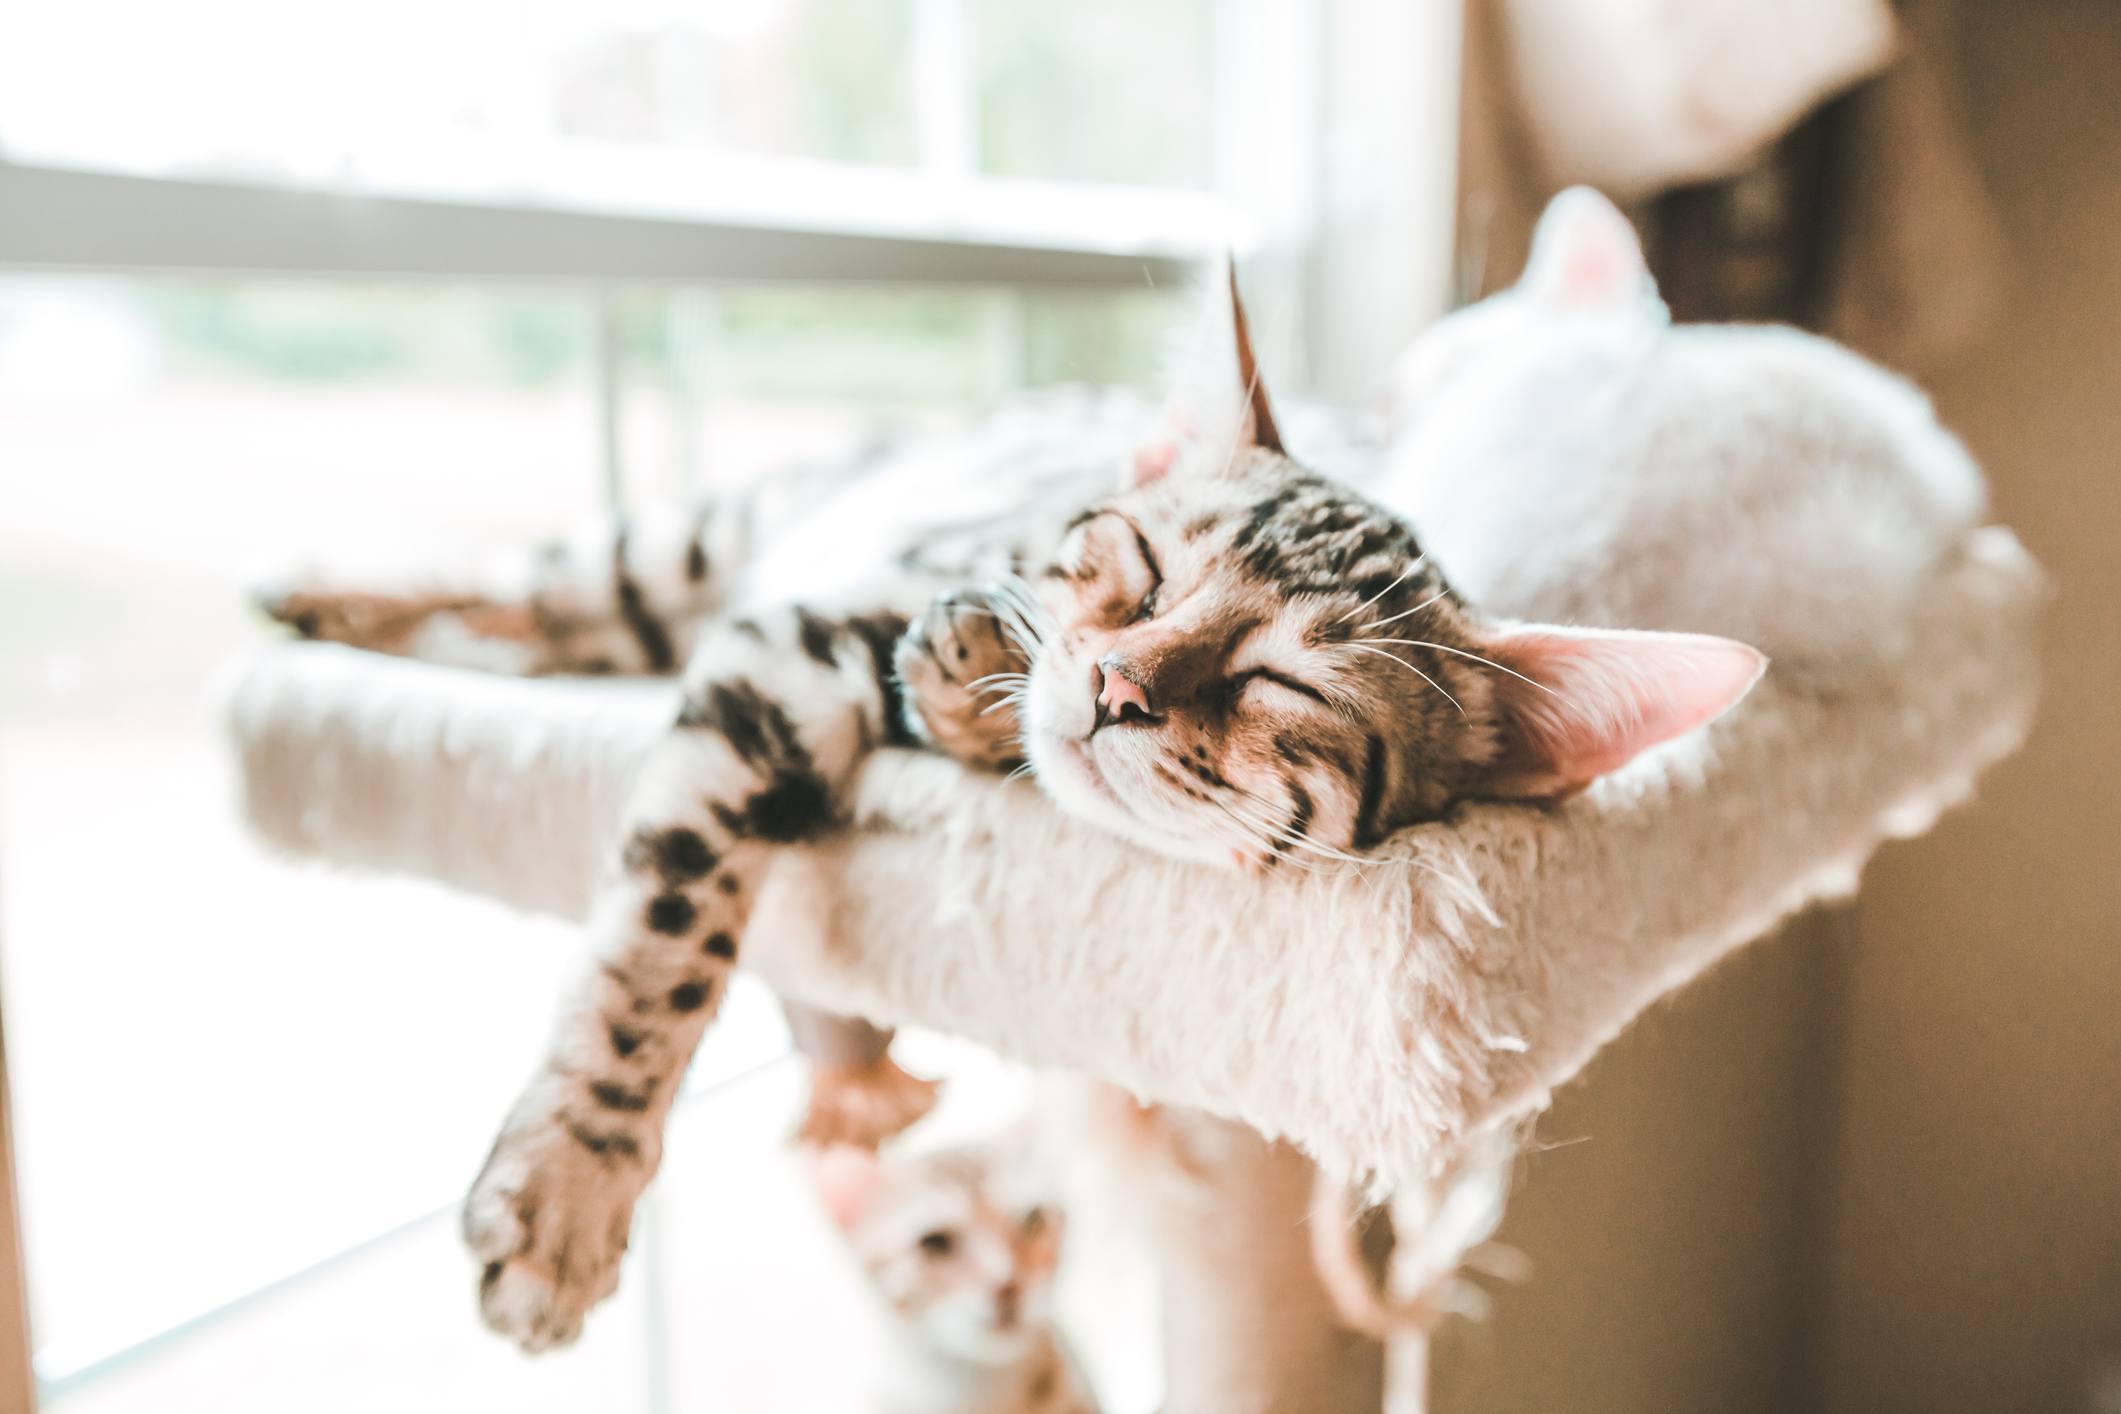 Tiger-striped cat sleeping on a cat ledge.